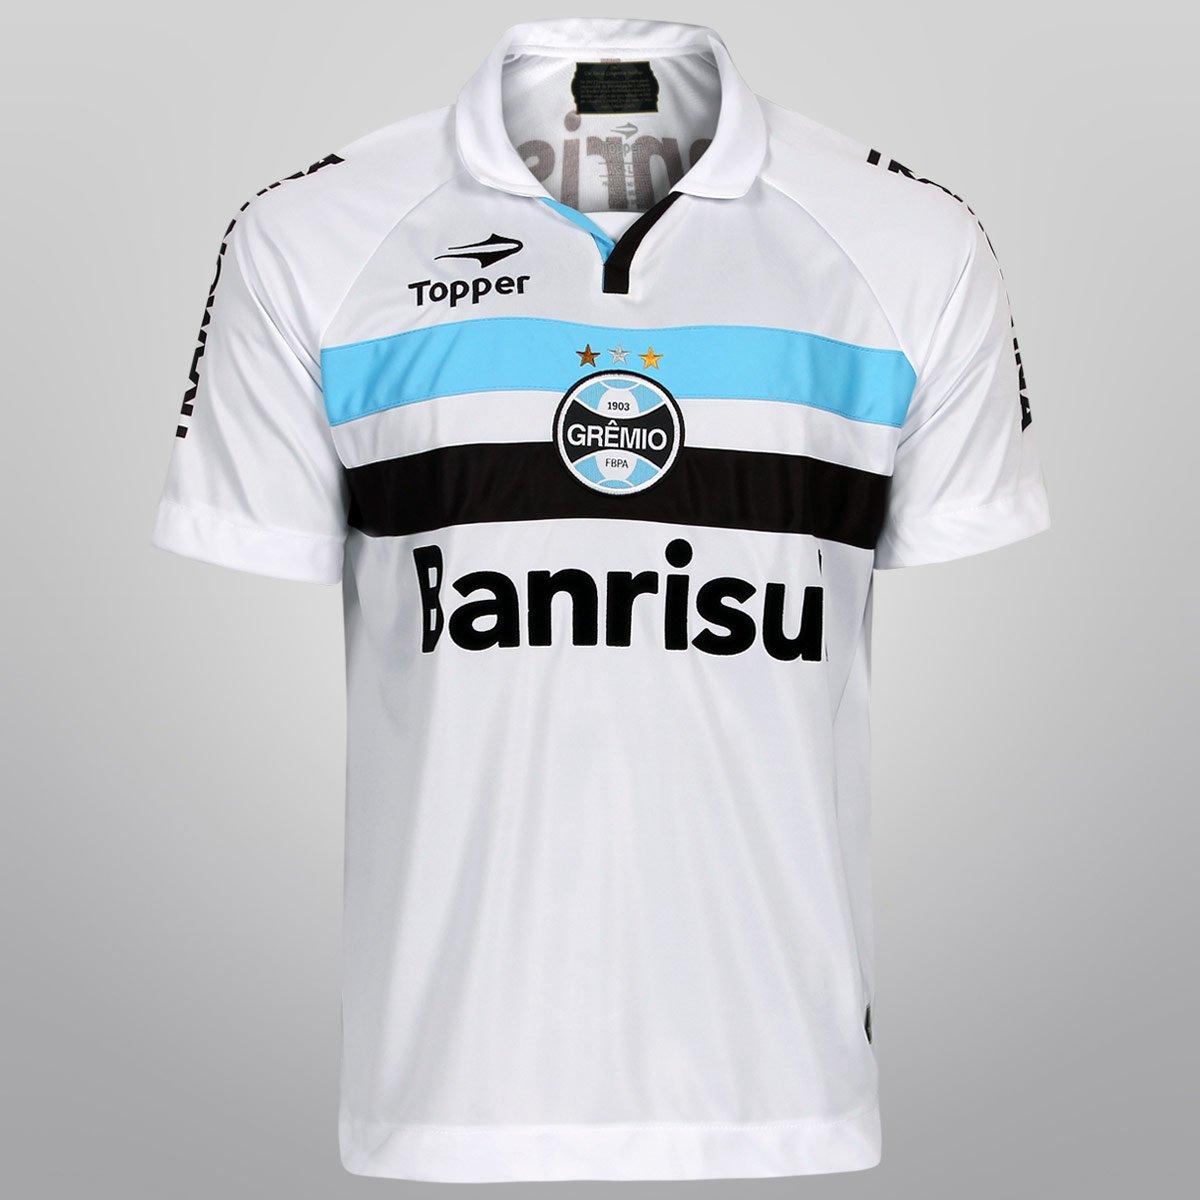 Camisa Topper Grêmio II 12 13 s nº - Compre Agora  b72caf6eb0113